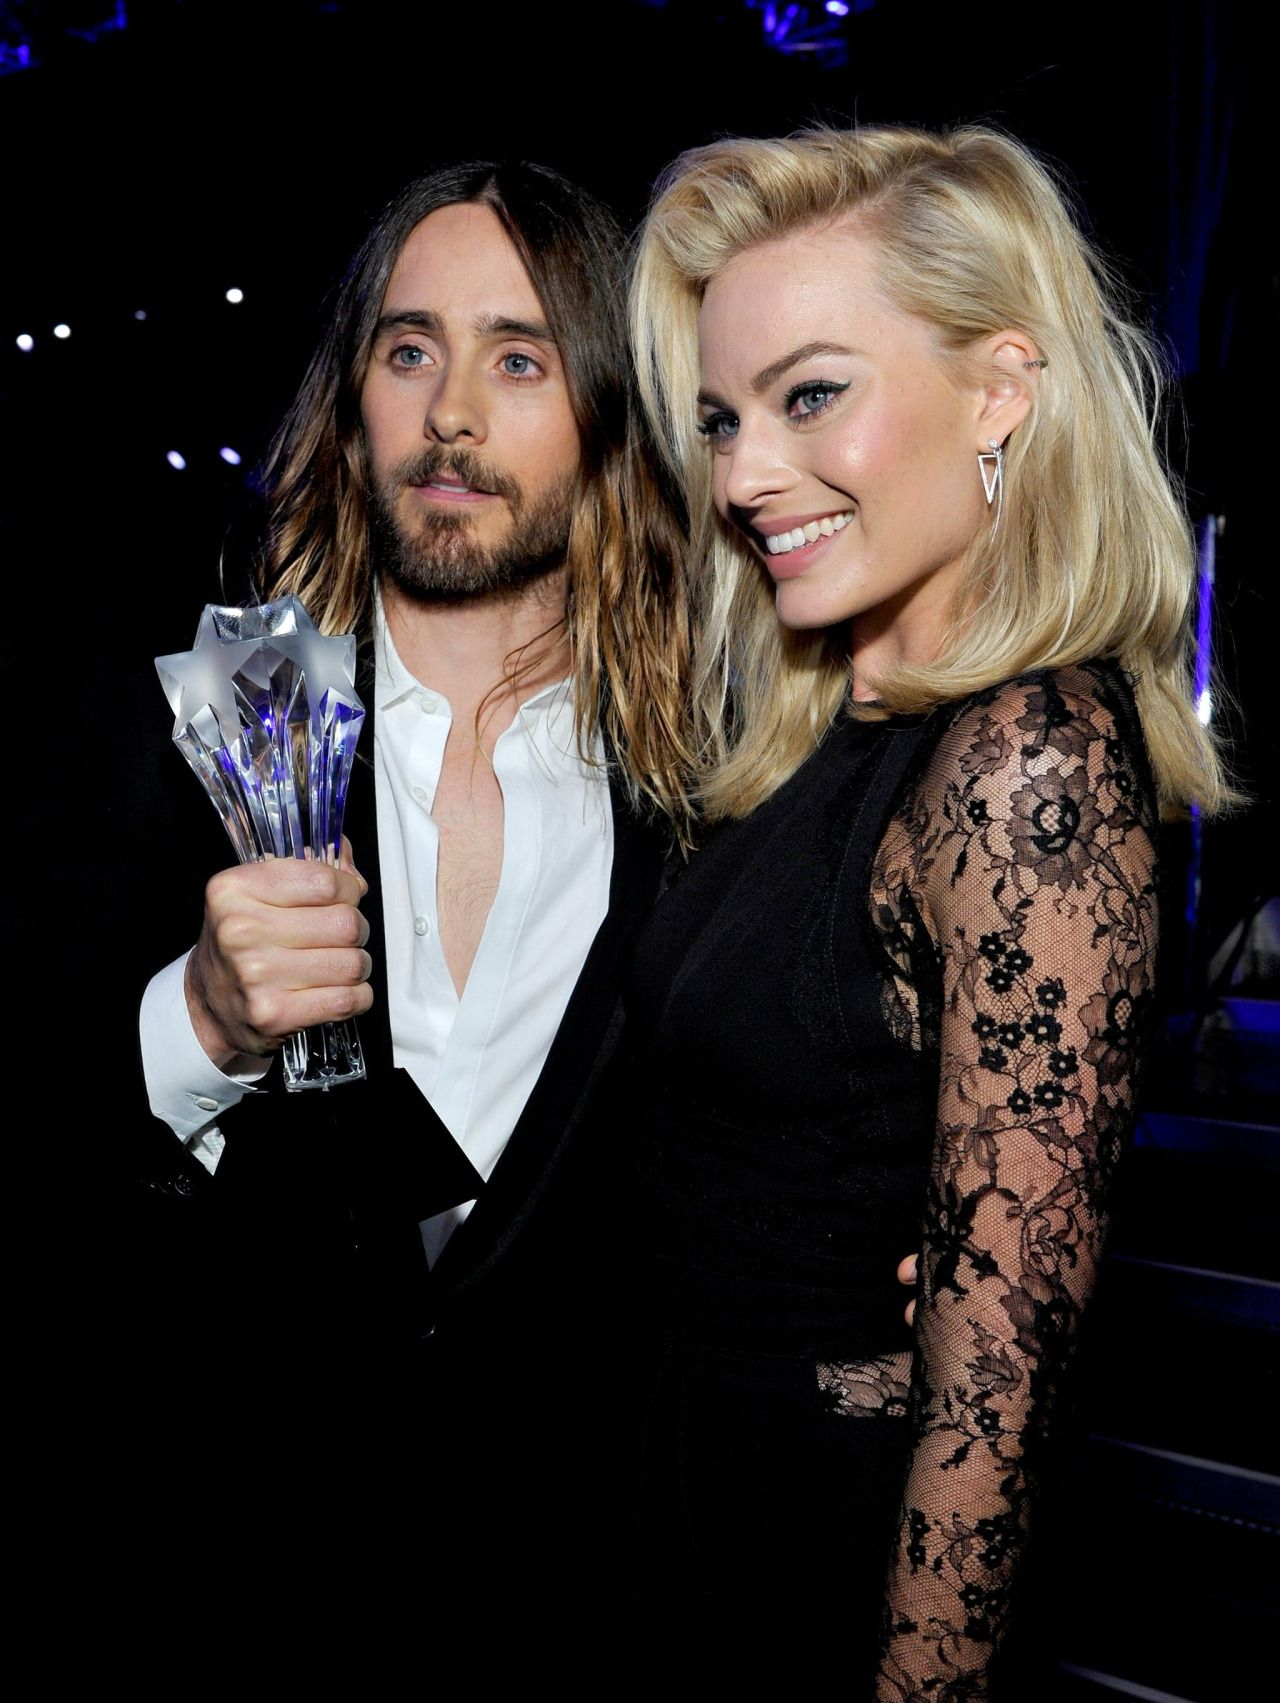 Joker & Harley -   Critics' Choice Awards, 2014... - just Jared and me